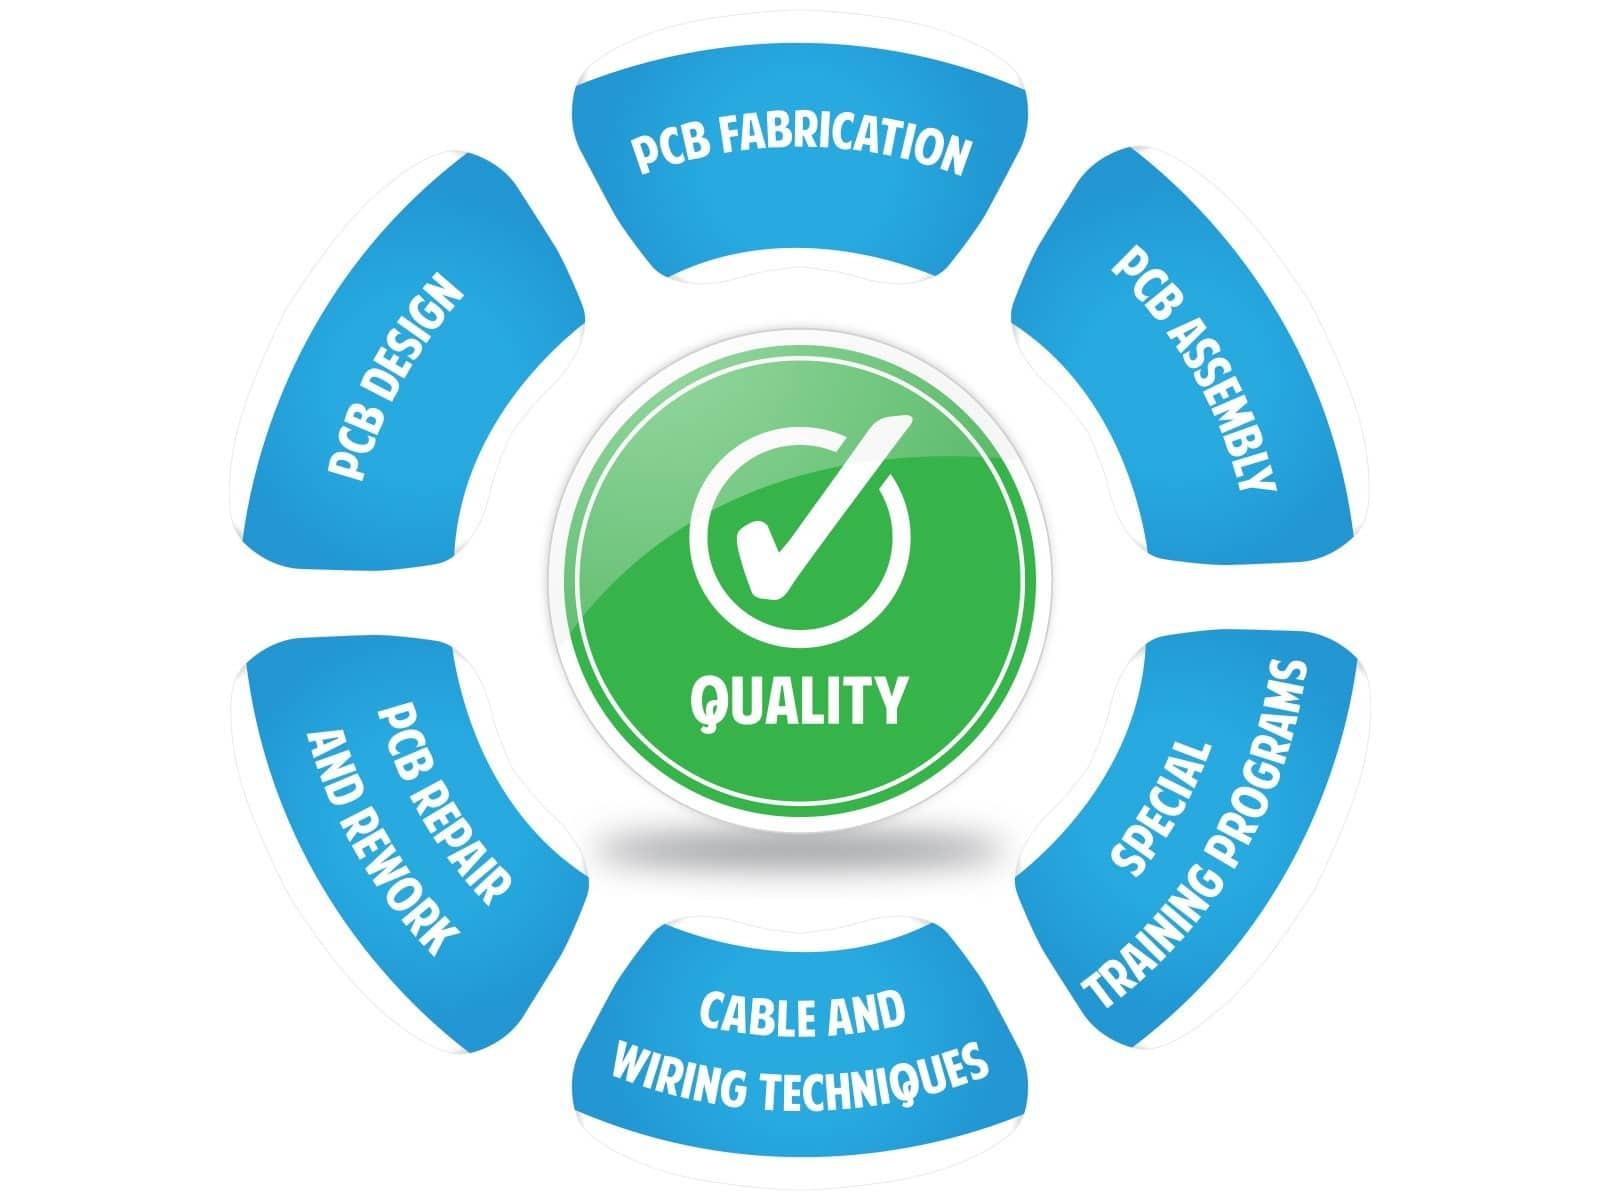 The PIEK quality circle